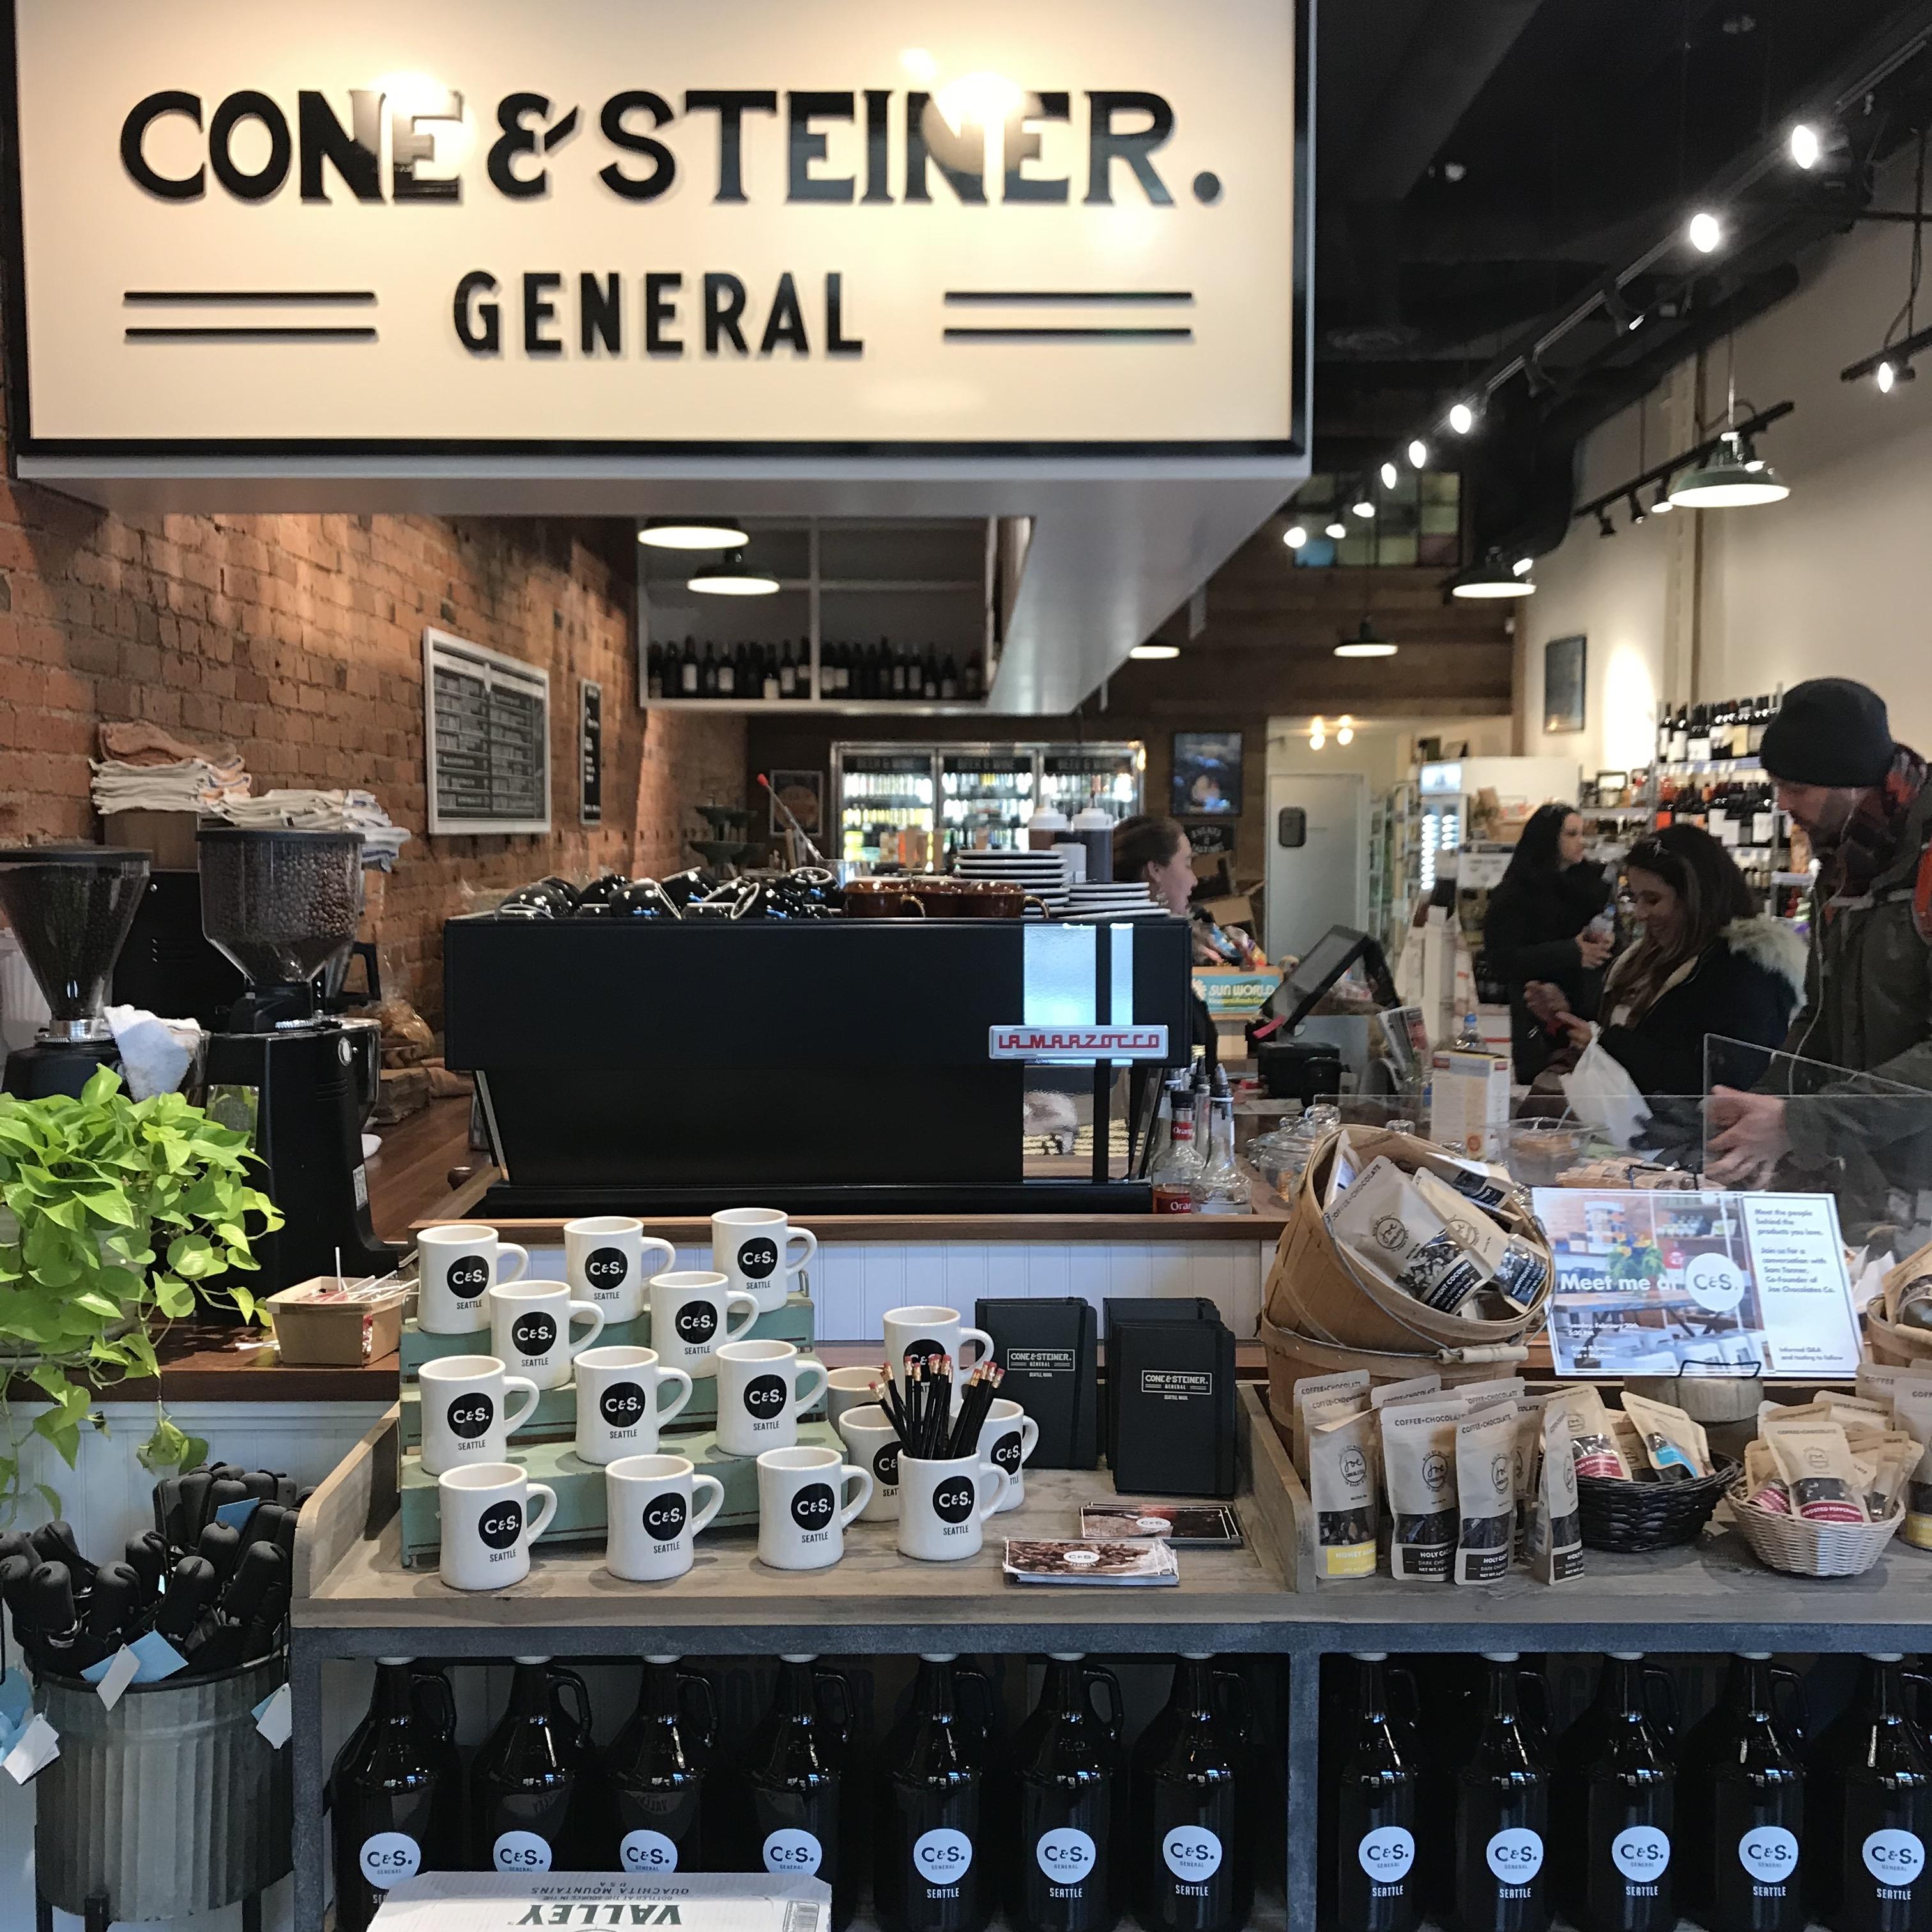 Cone & Steiner - Pioneer Square